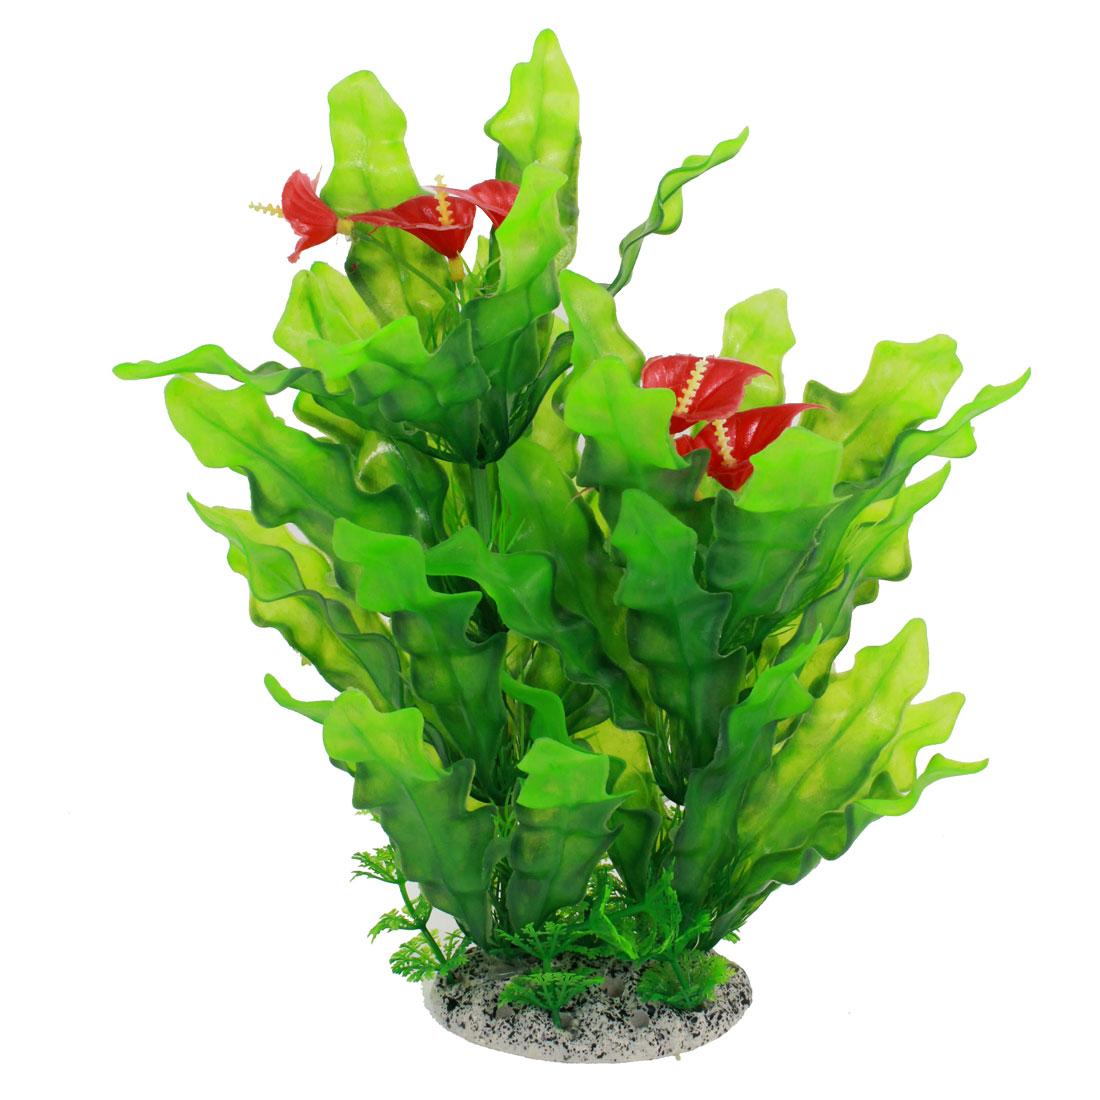 "Fish Tank Decor Artificial Flower Accent Water Grass Green Red 11.5"" Height"